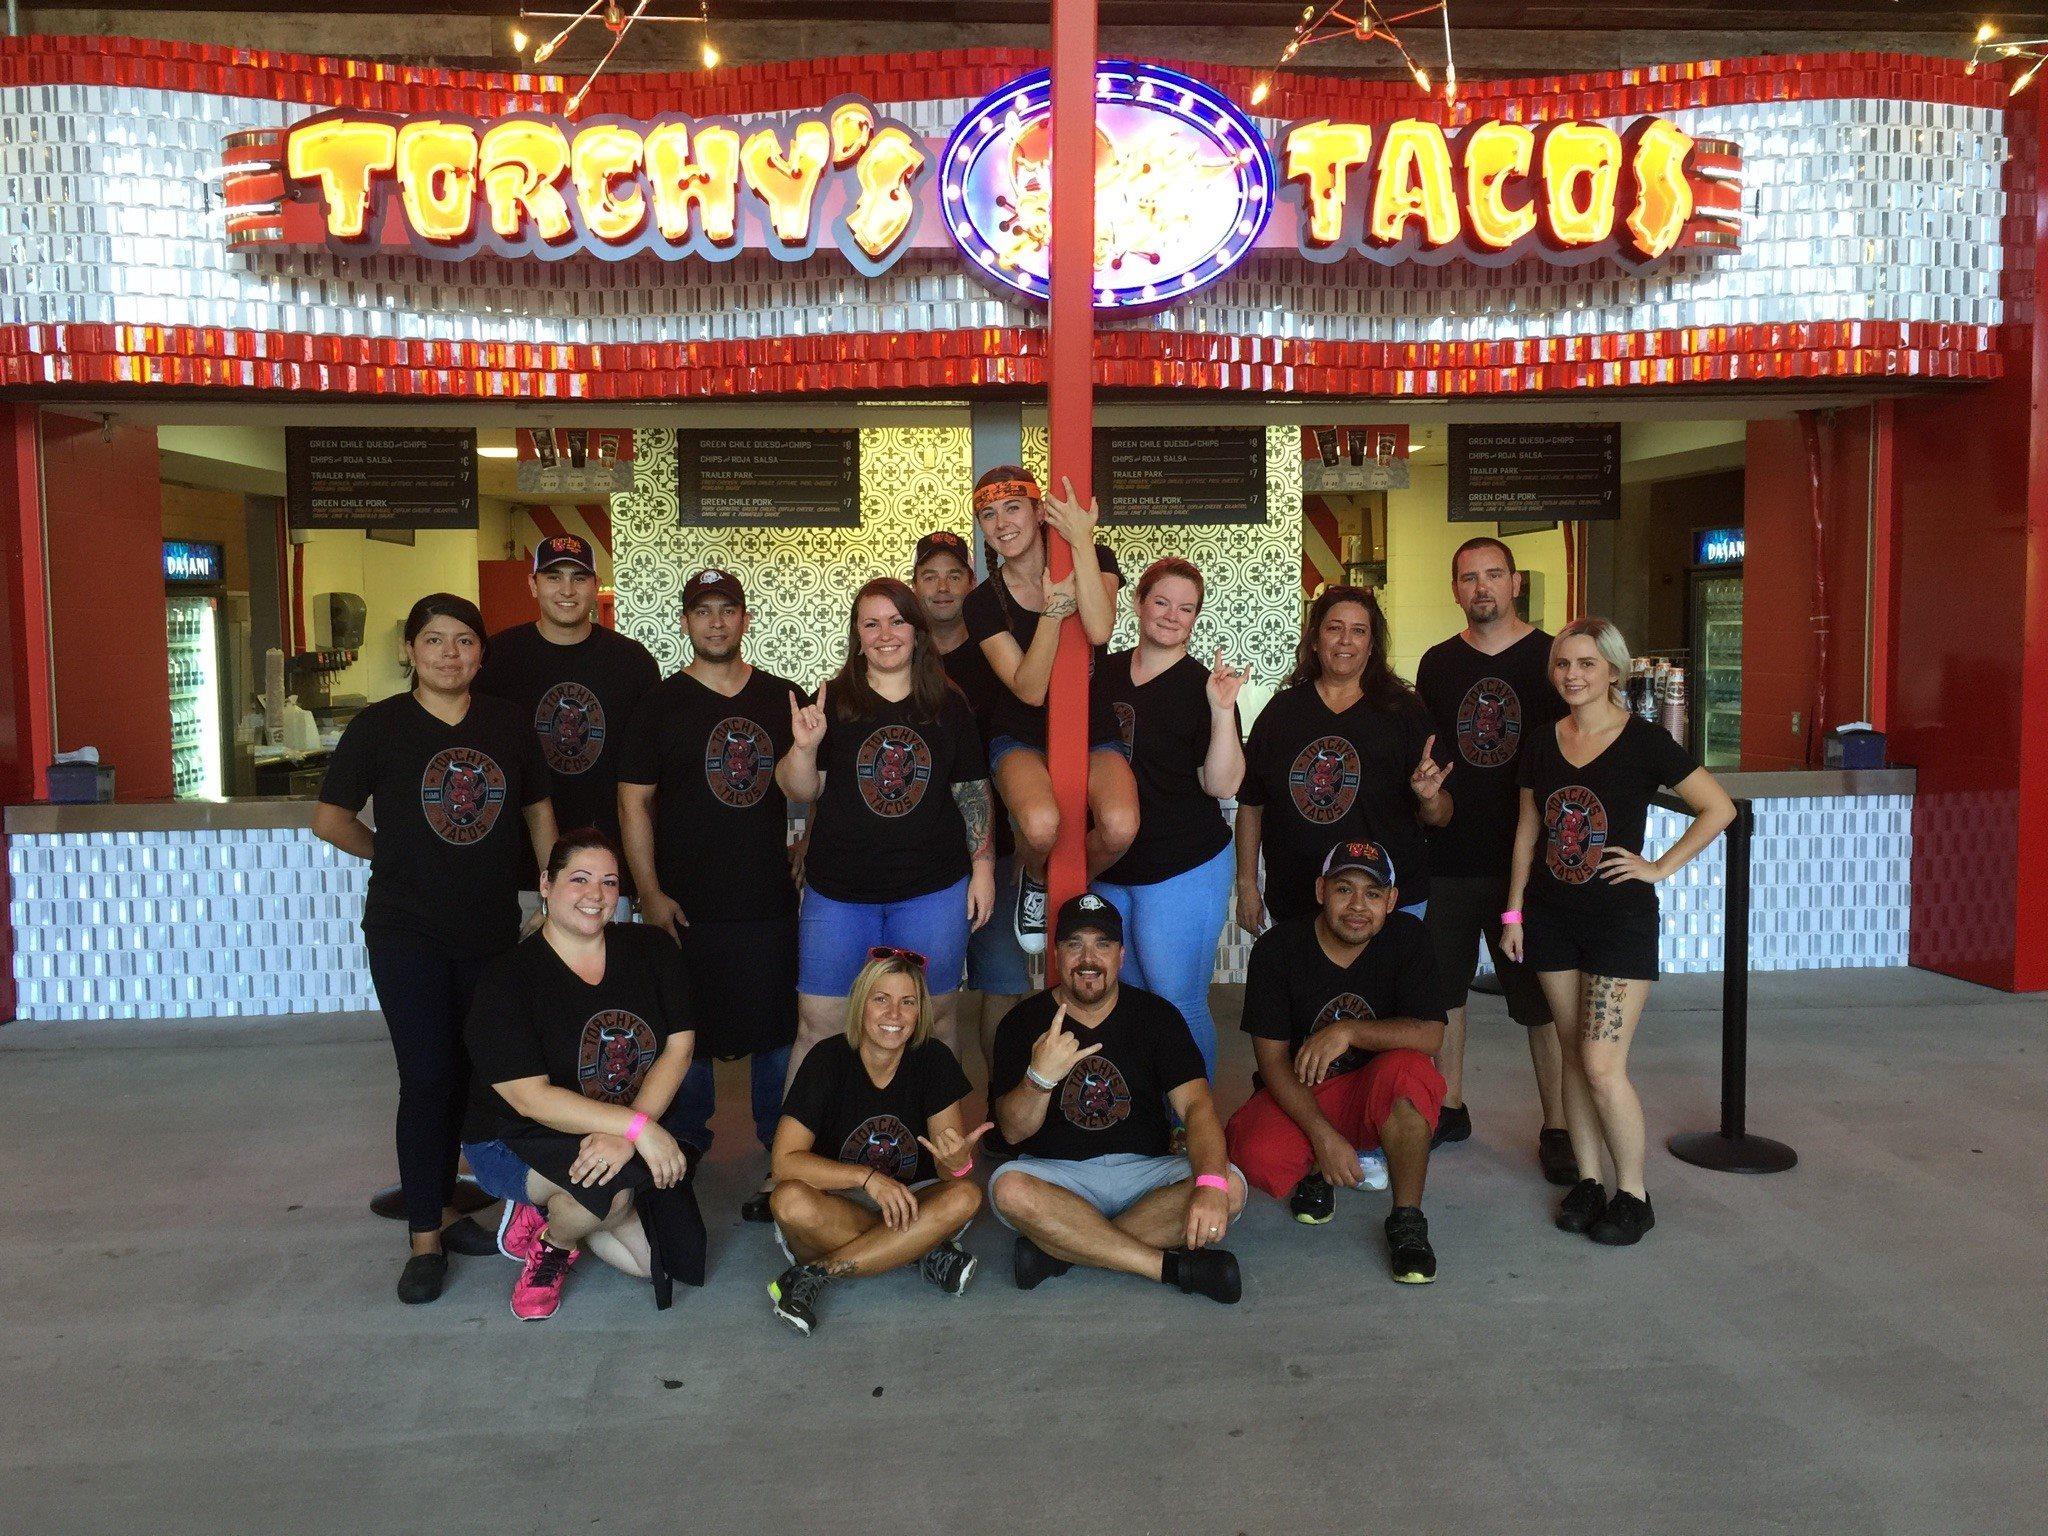 Torchy's Tacos at Darrell K. Royal-Texas Memorial Stadium